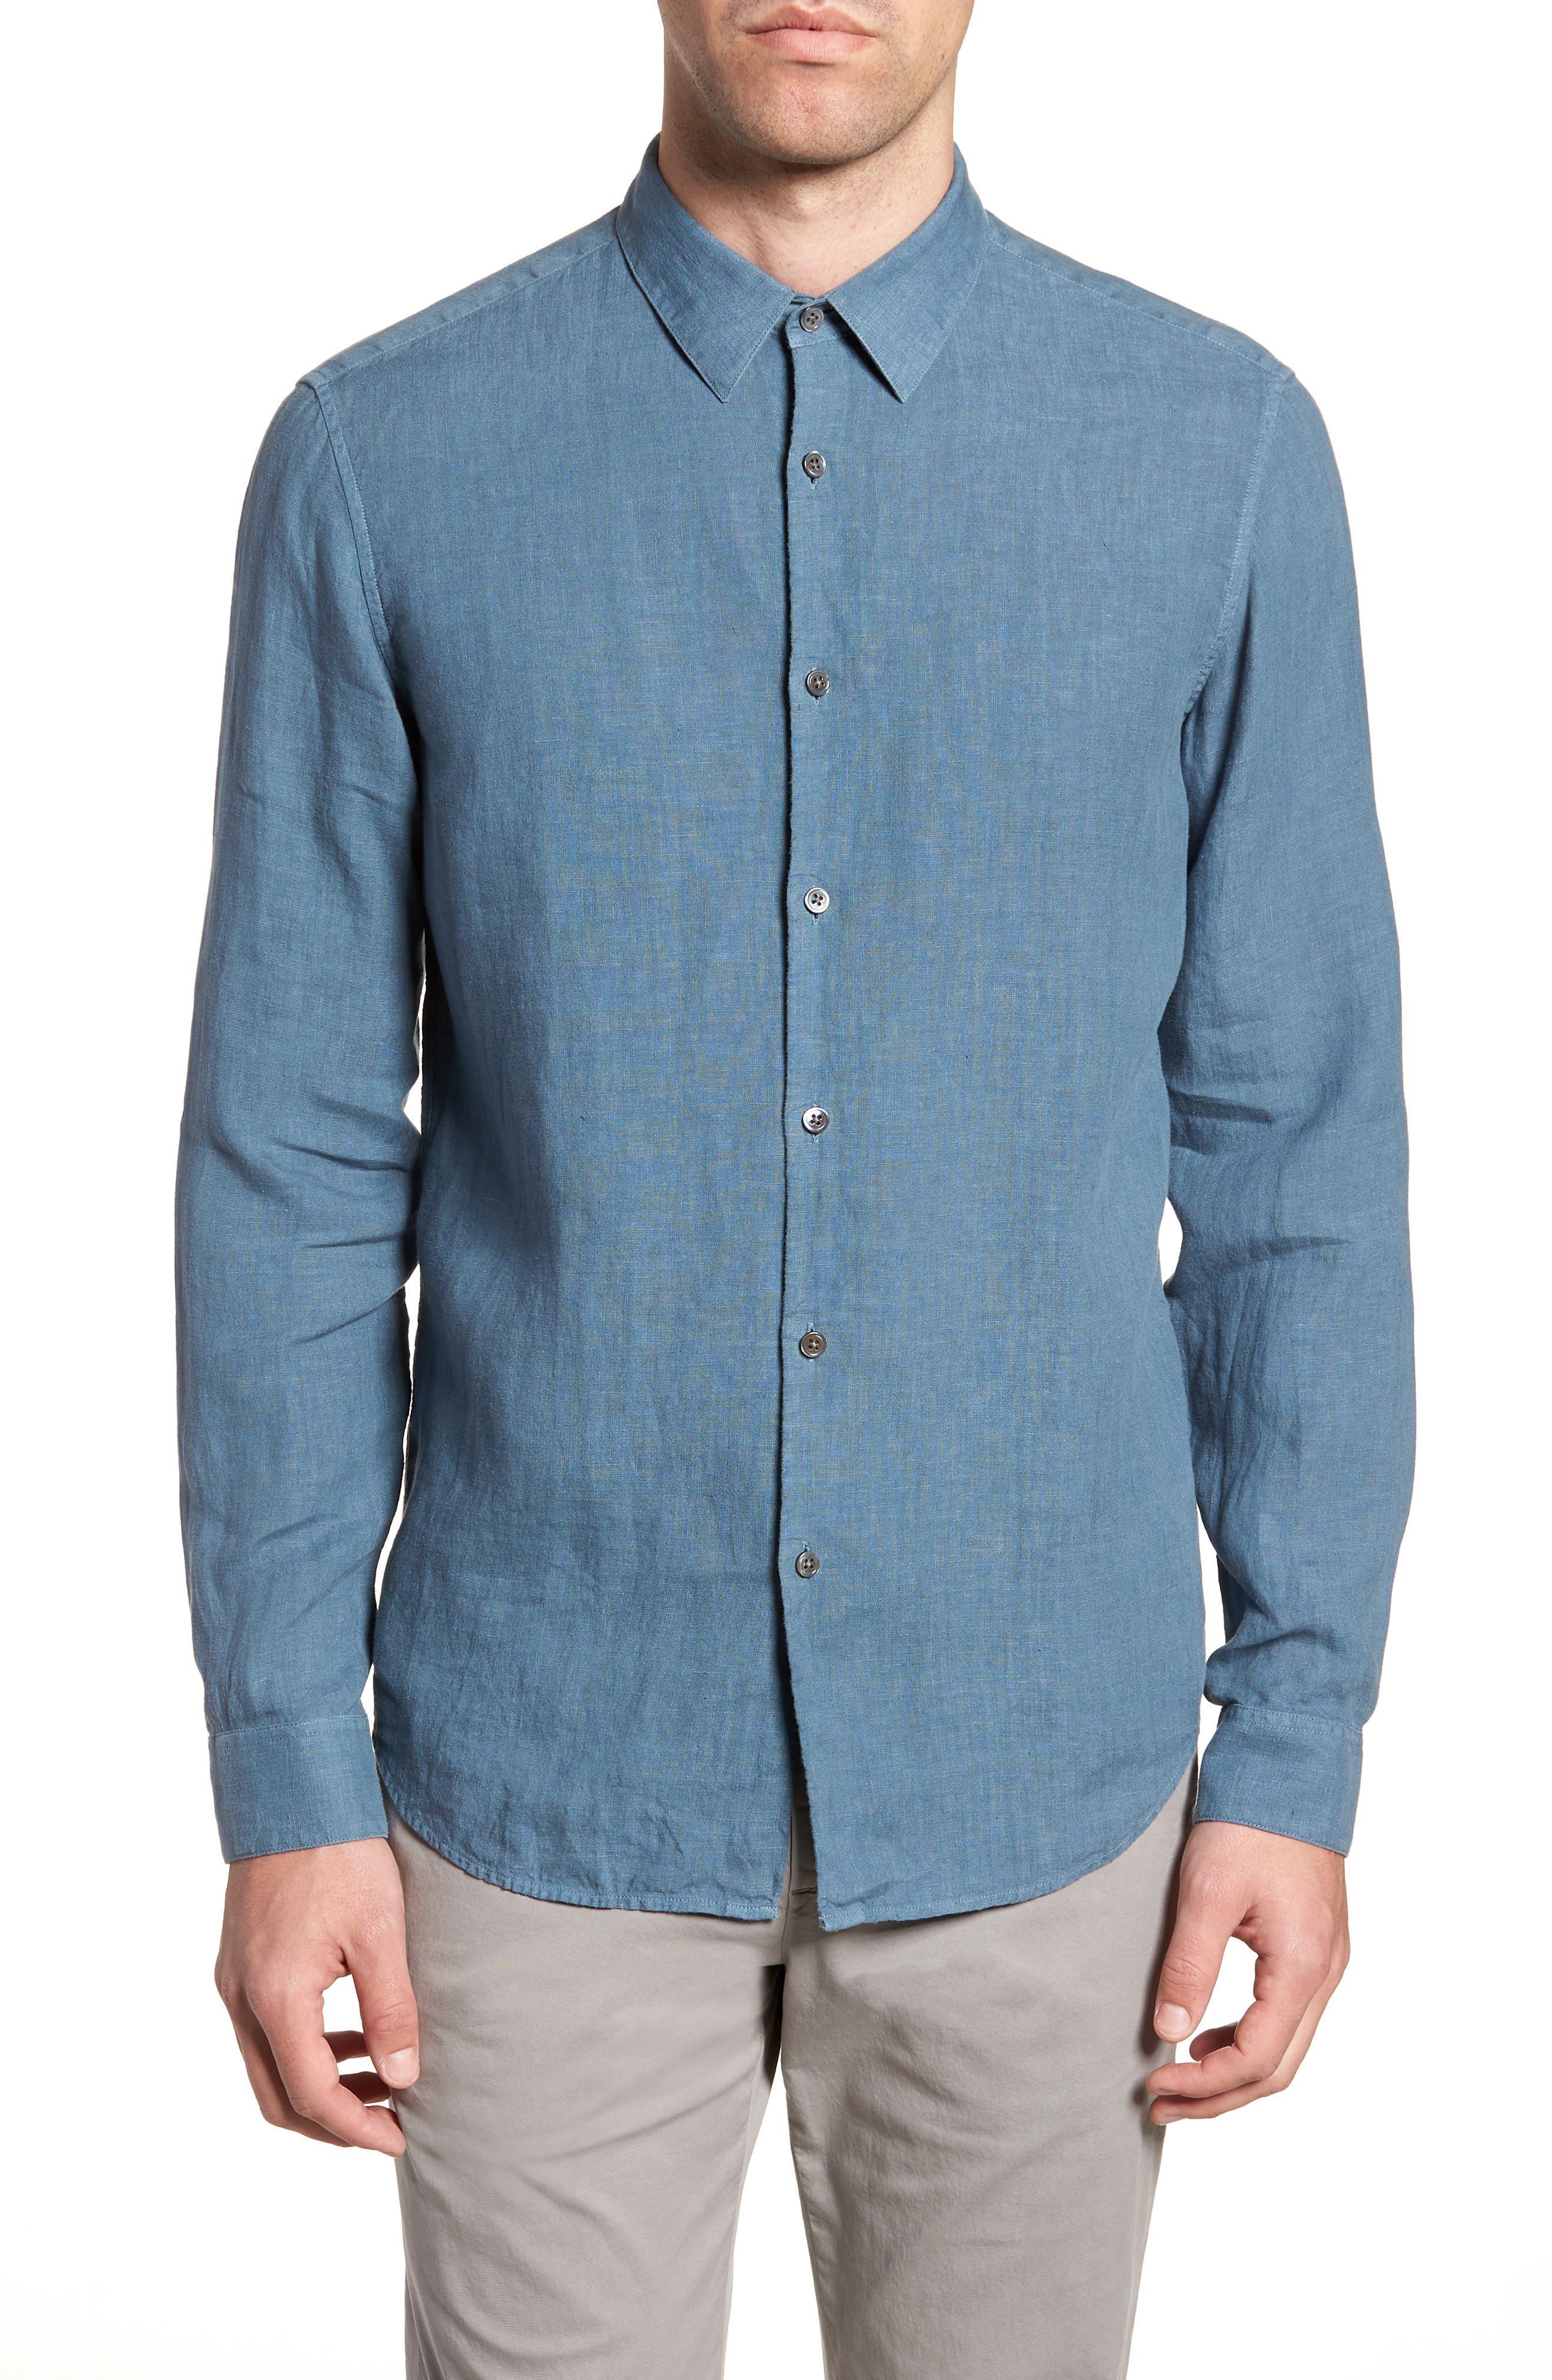 Irving Trim Fit Solid Linen Sport Shirt,                         Main,                         color, Hydro